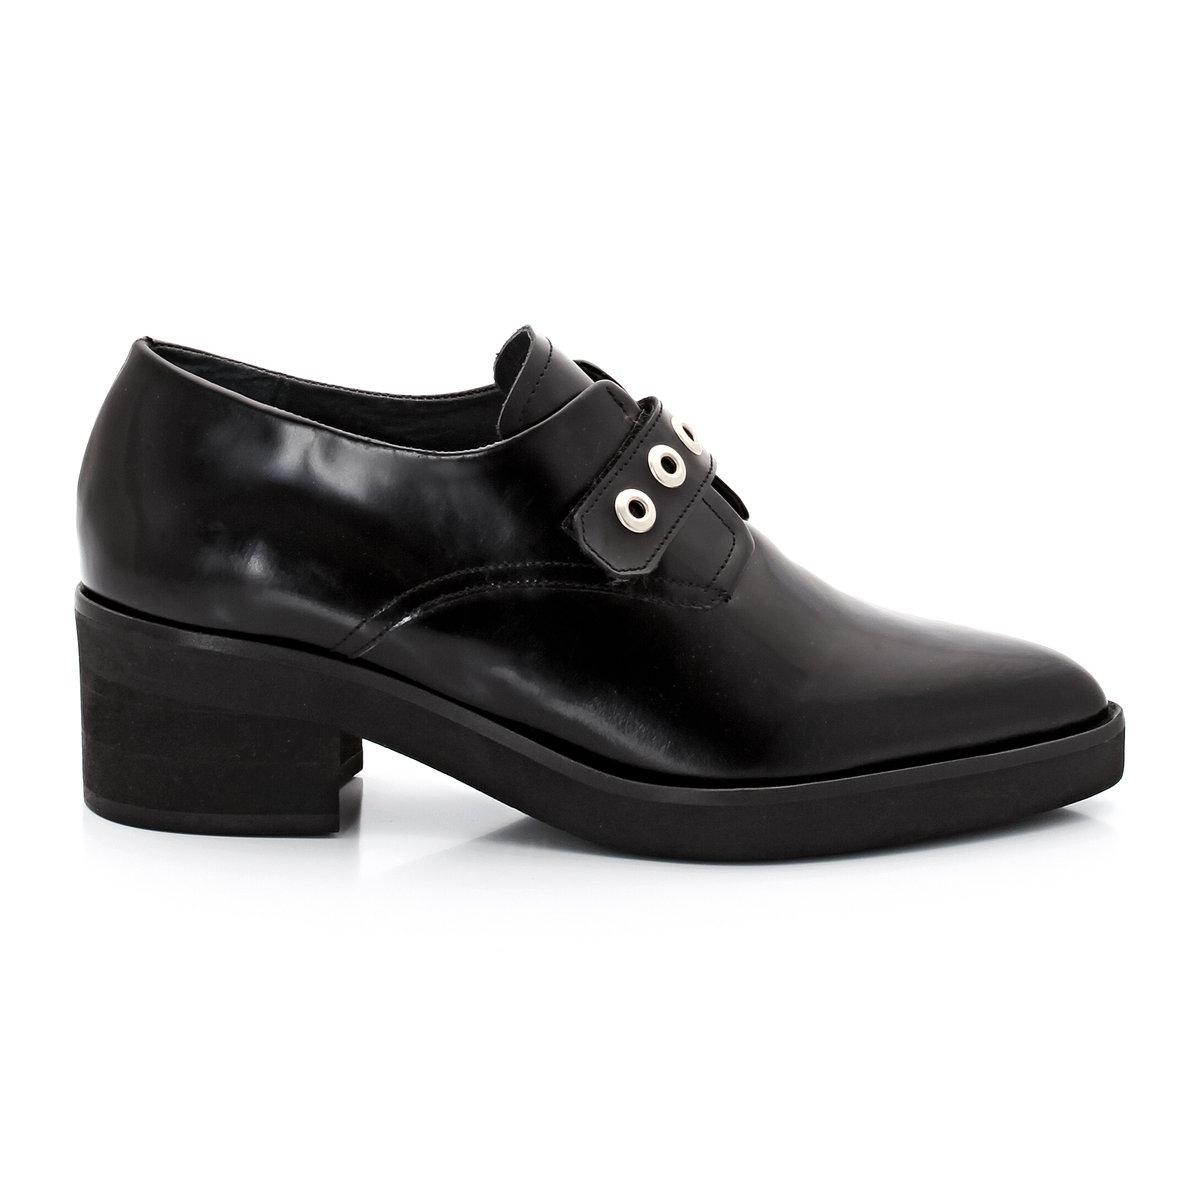 Ботинки-дерби из кожи DARNELL от La Redoute